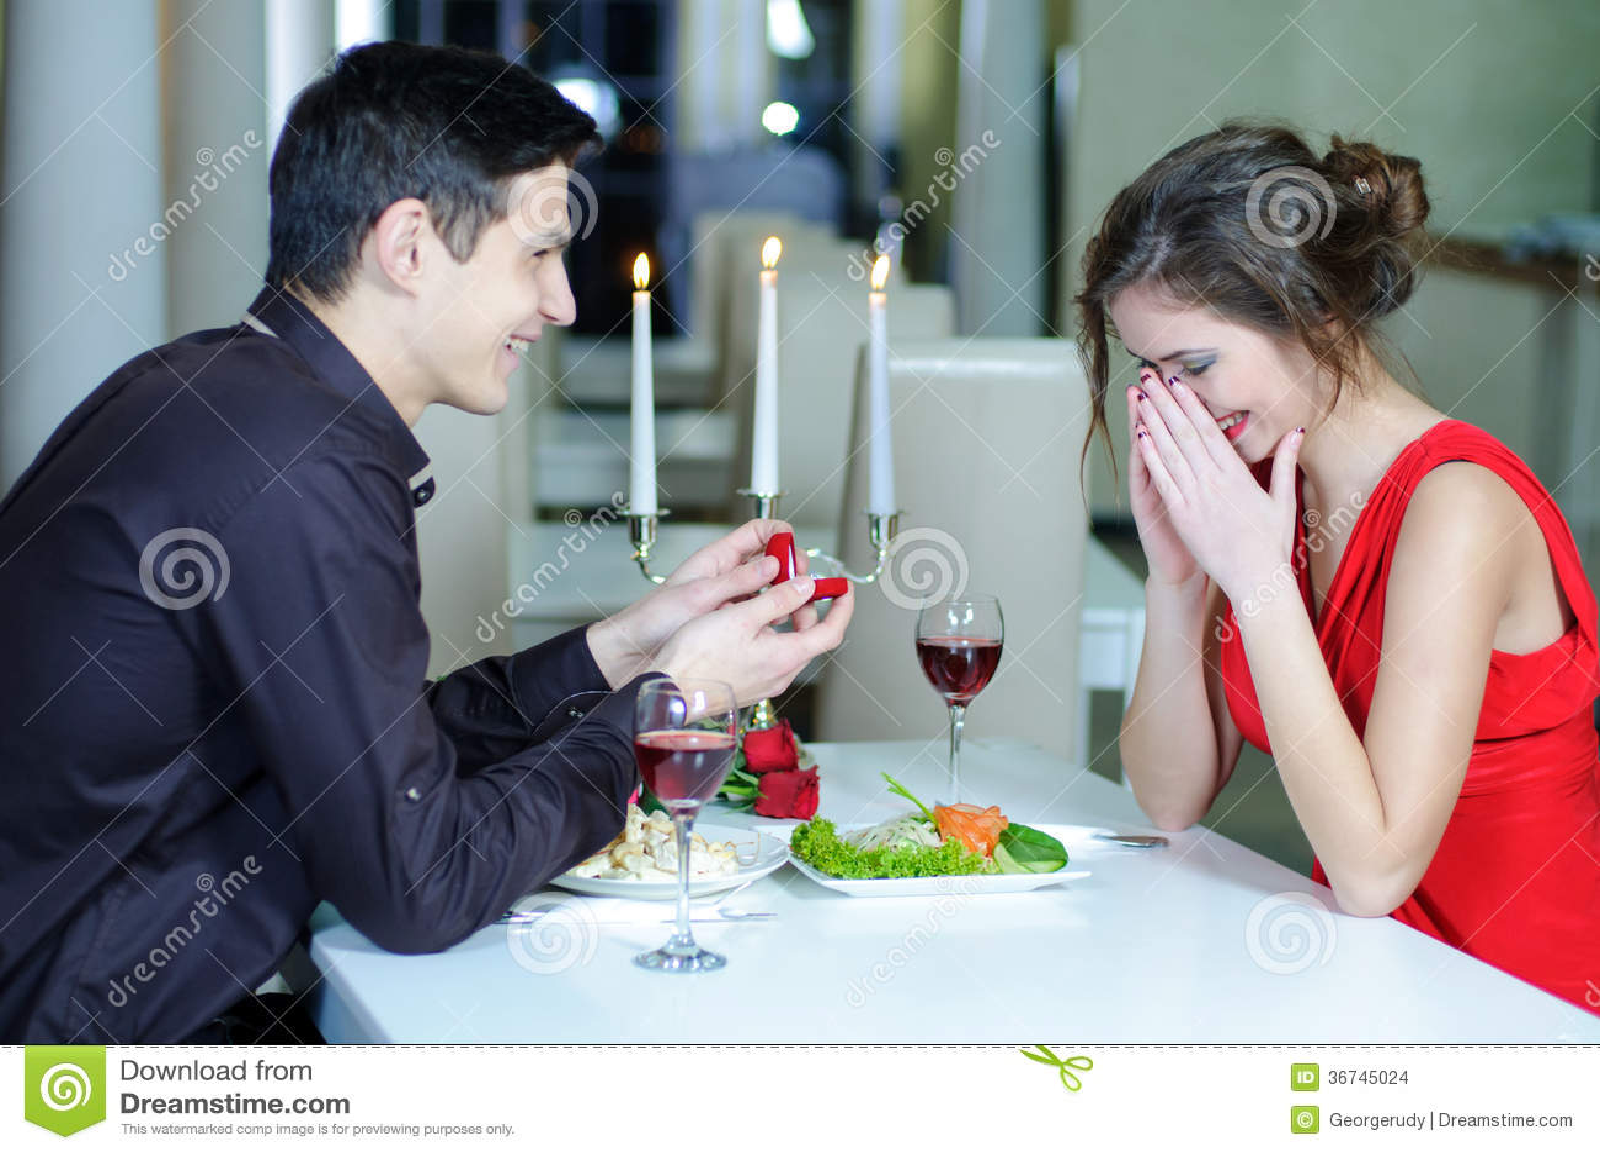 Online dating valentines day